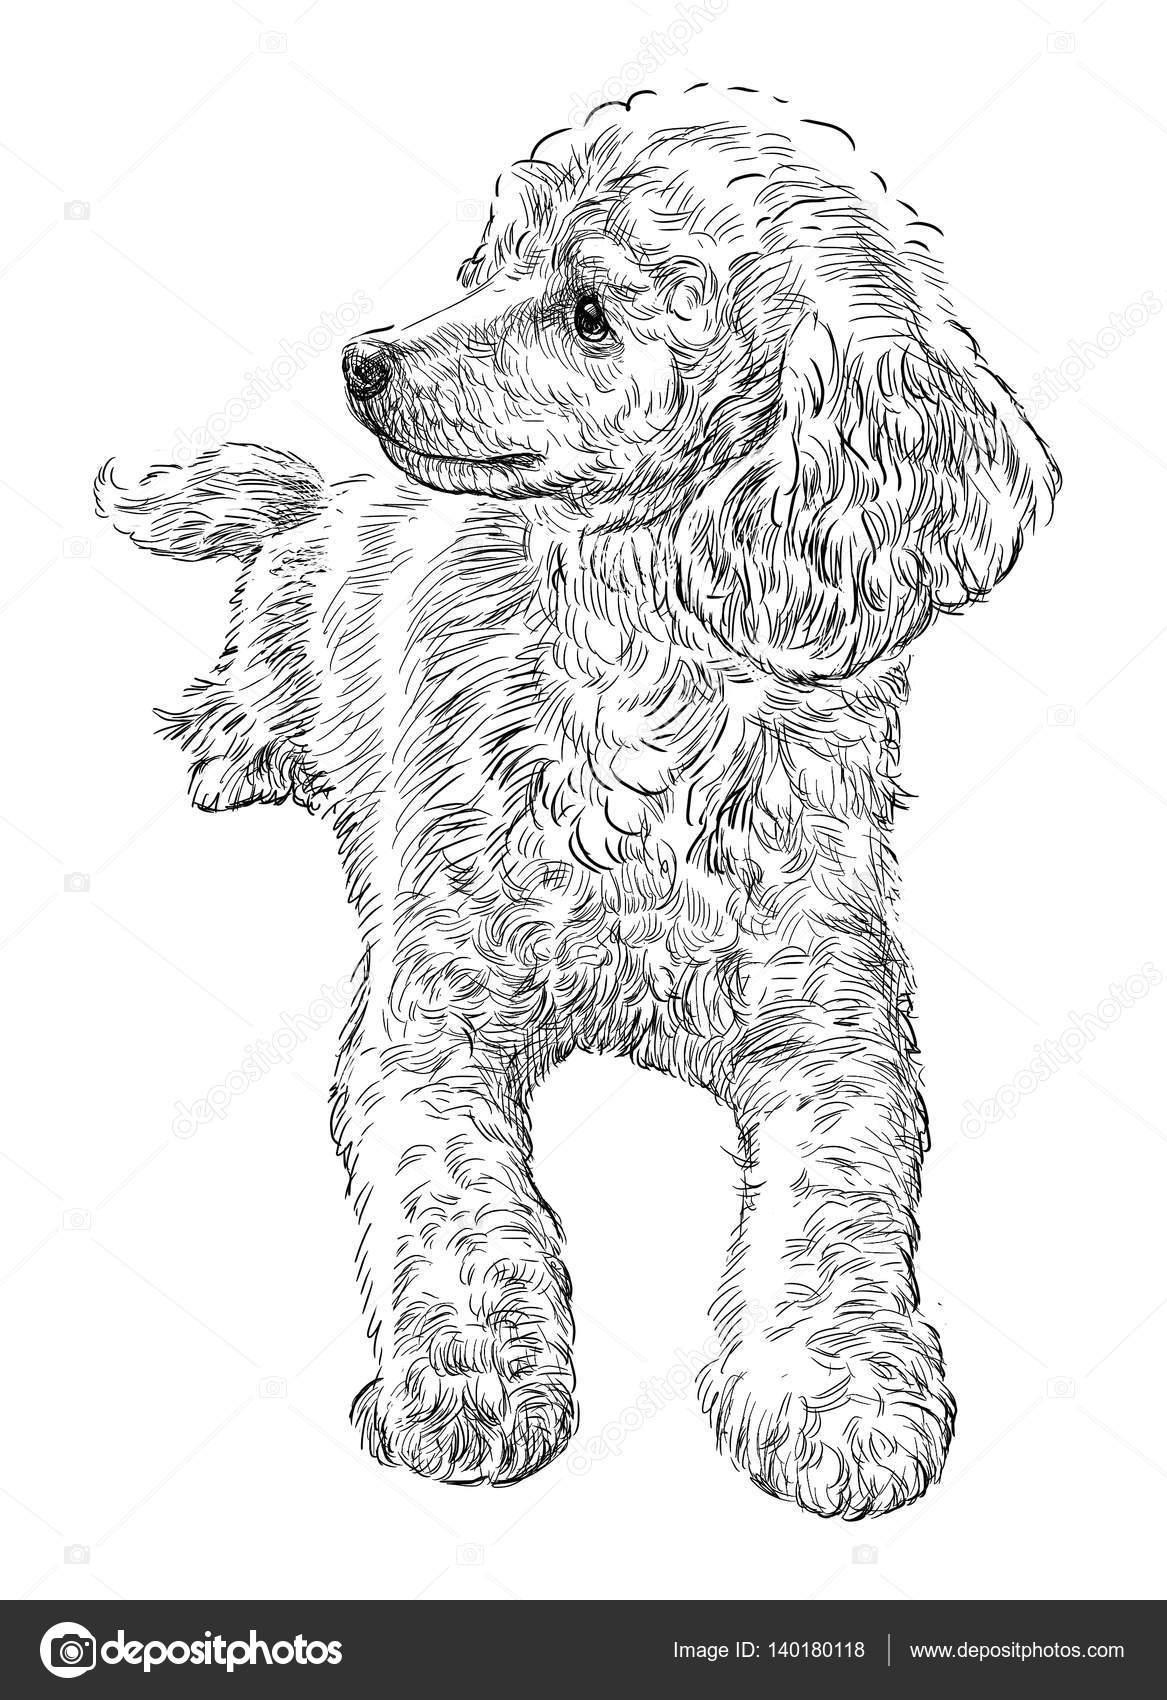 Dibujos Perritos Poodle Dibujo De Un Caniche Foto De Stock